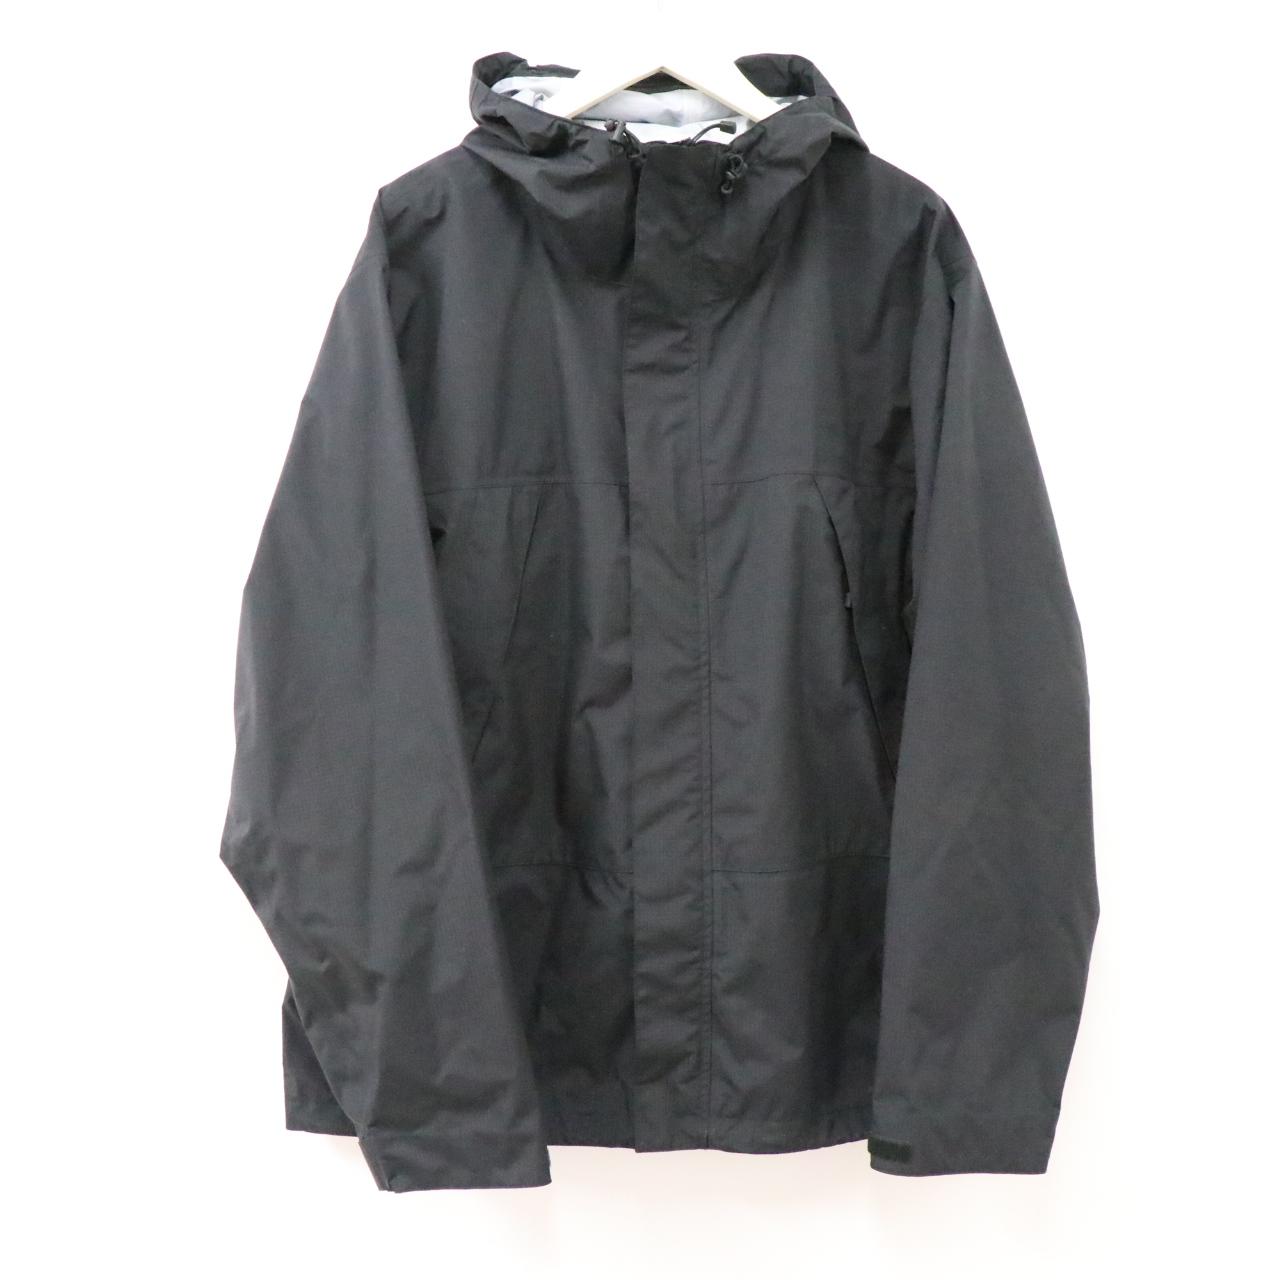 18SS Taped Seam Jacket